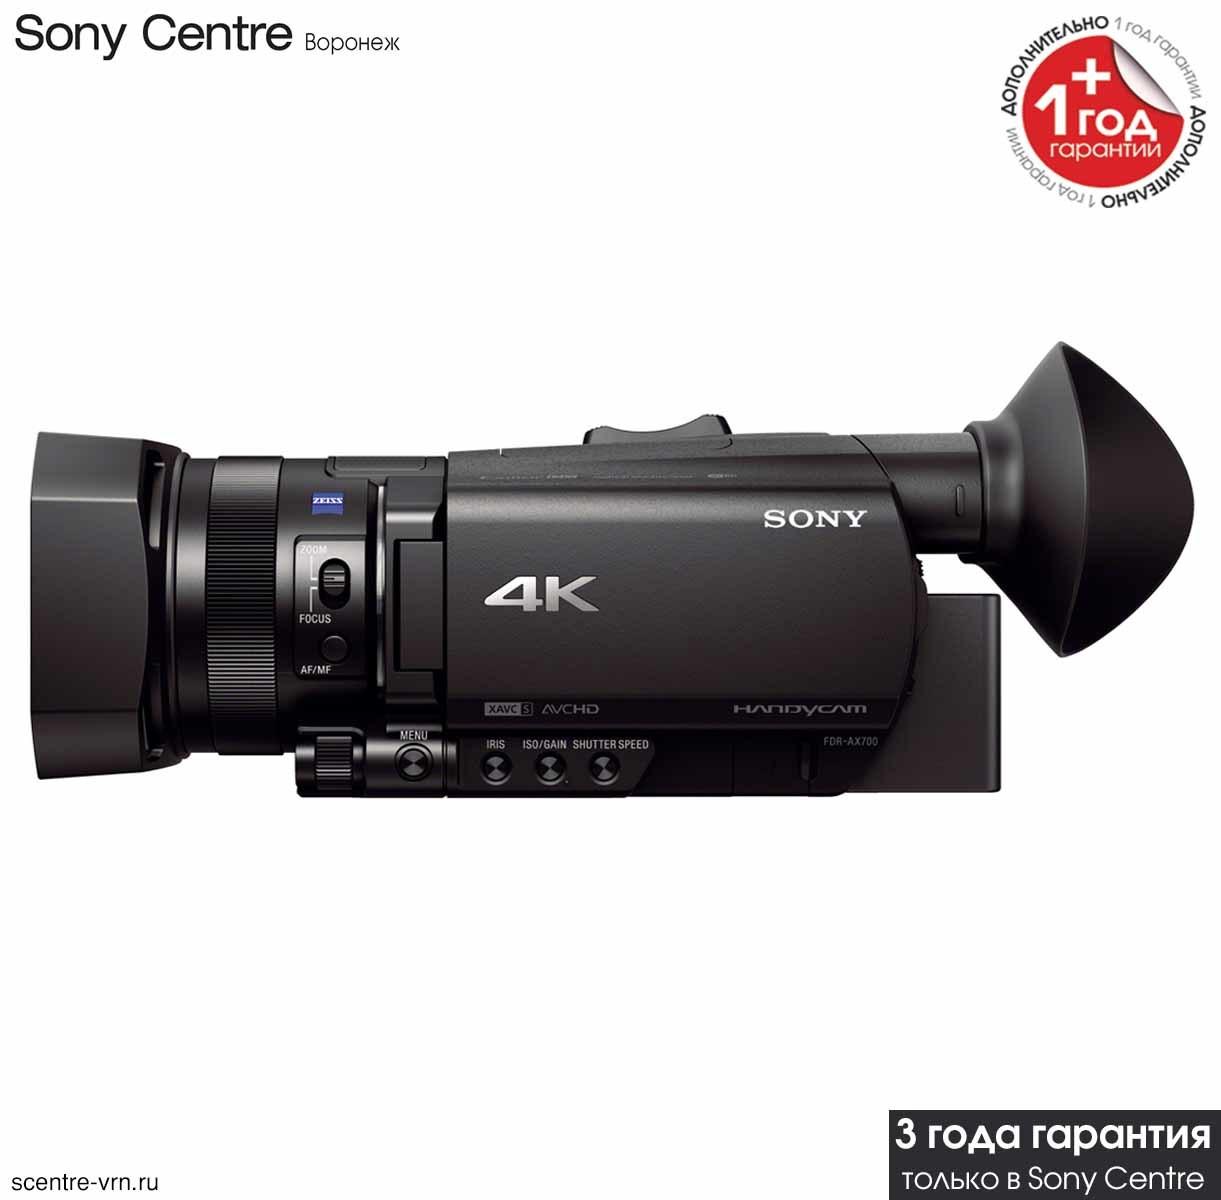 Купить видеокамеру Sony FDR-AX700 в Sony Centre Воронеж